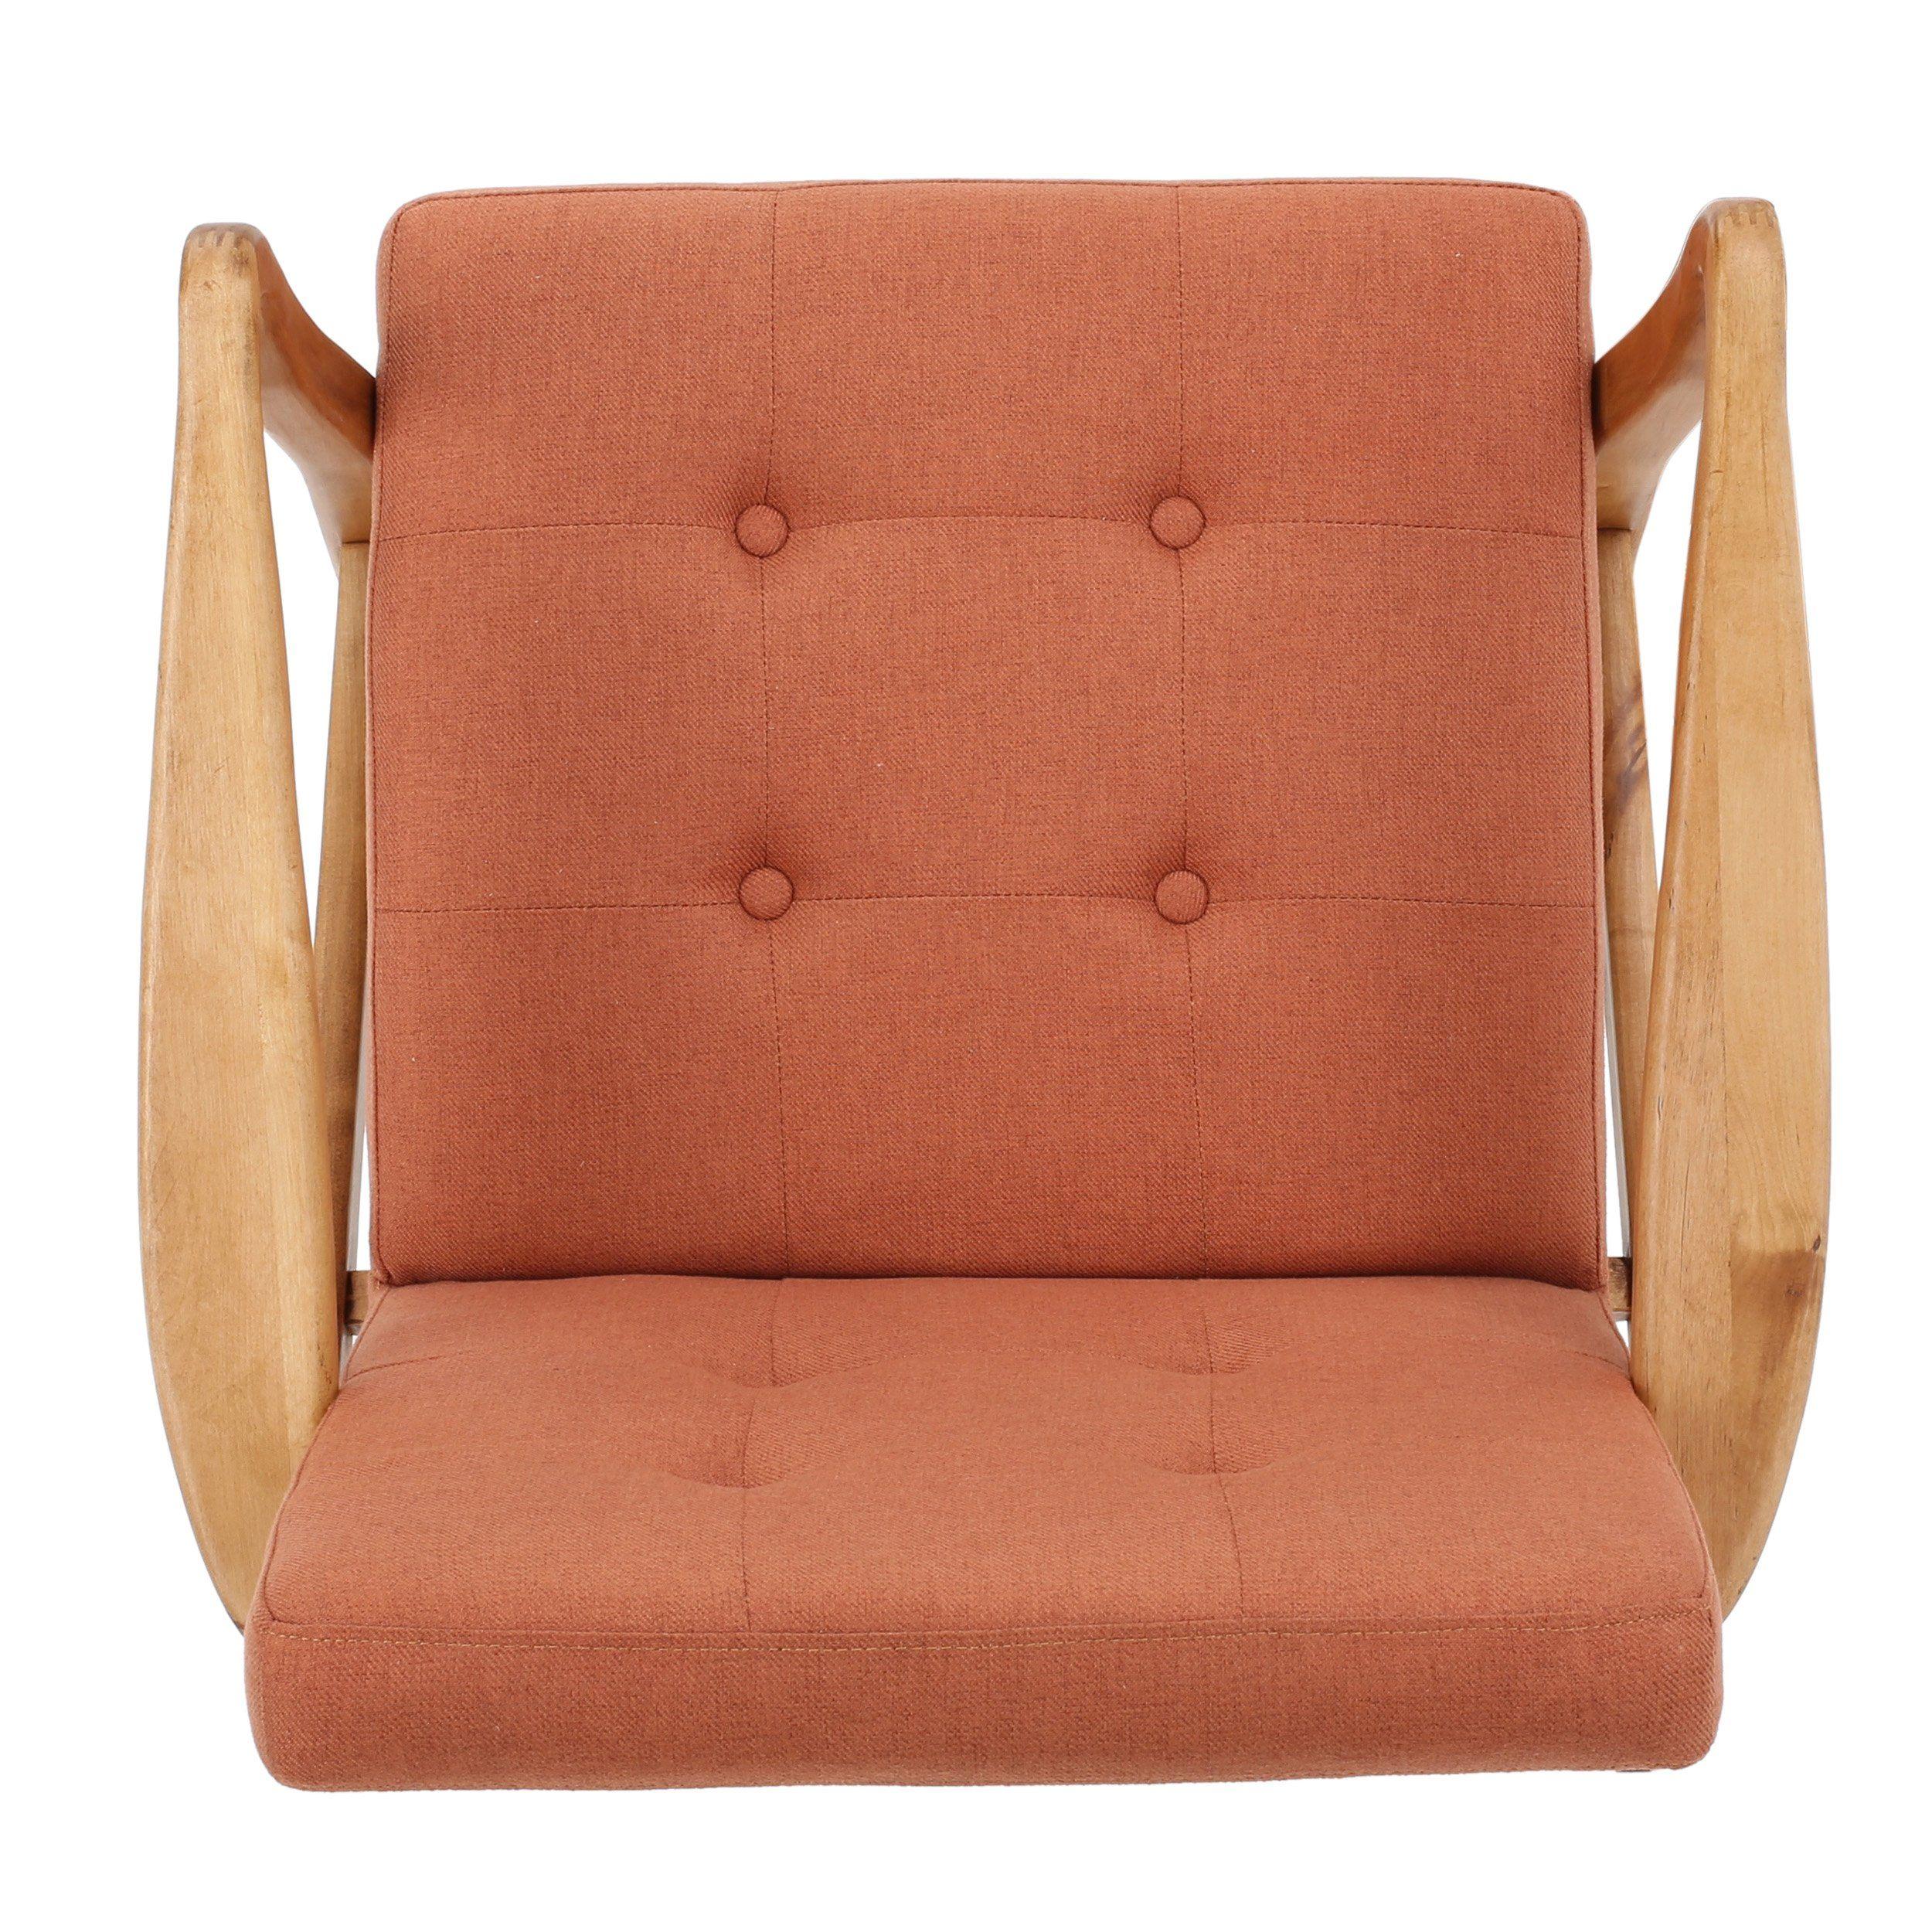 Gdf studio 300073 conrad orange fabric mid century modern